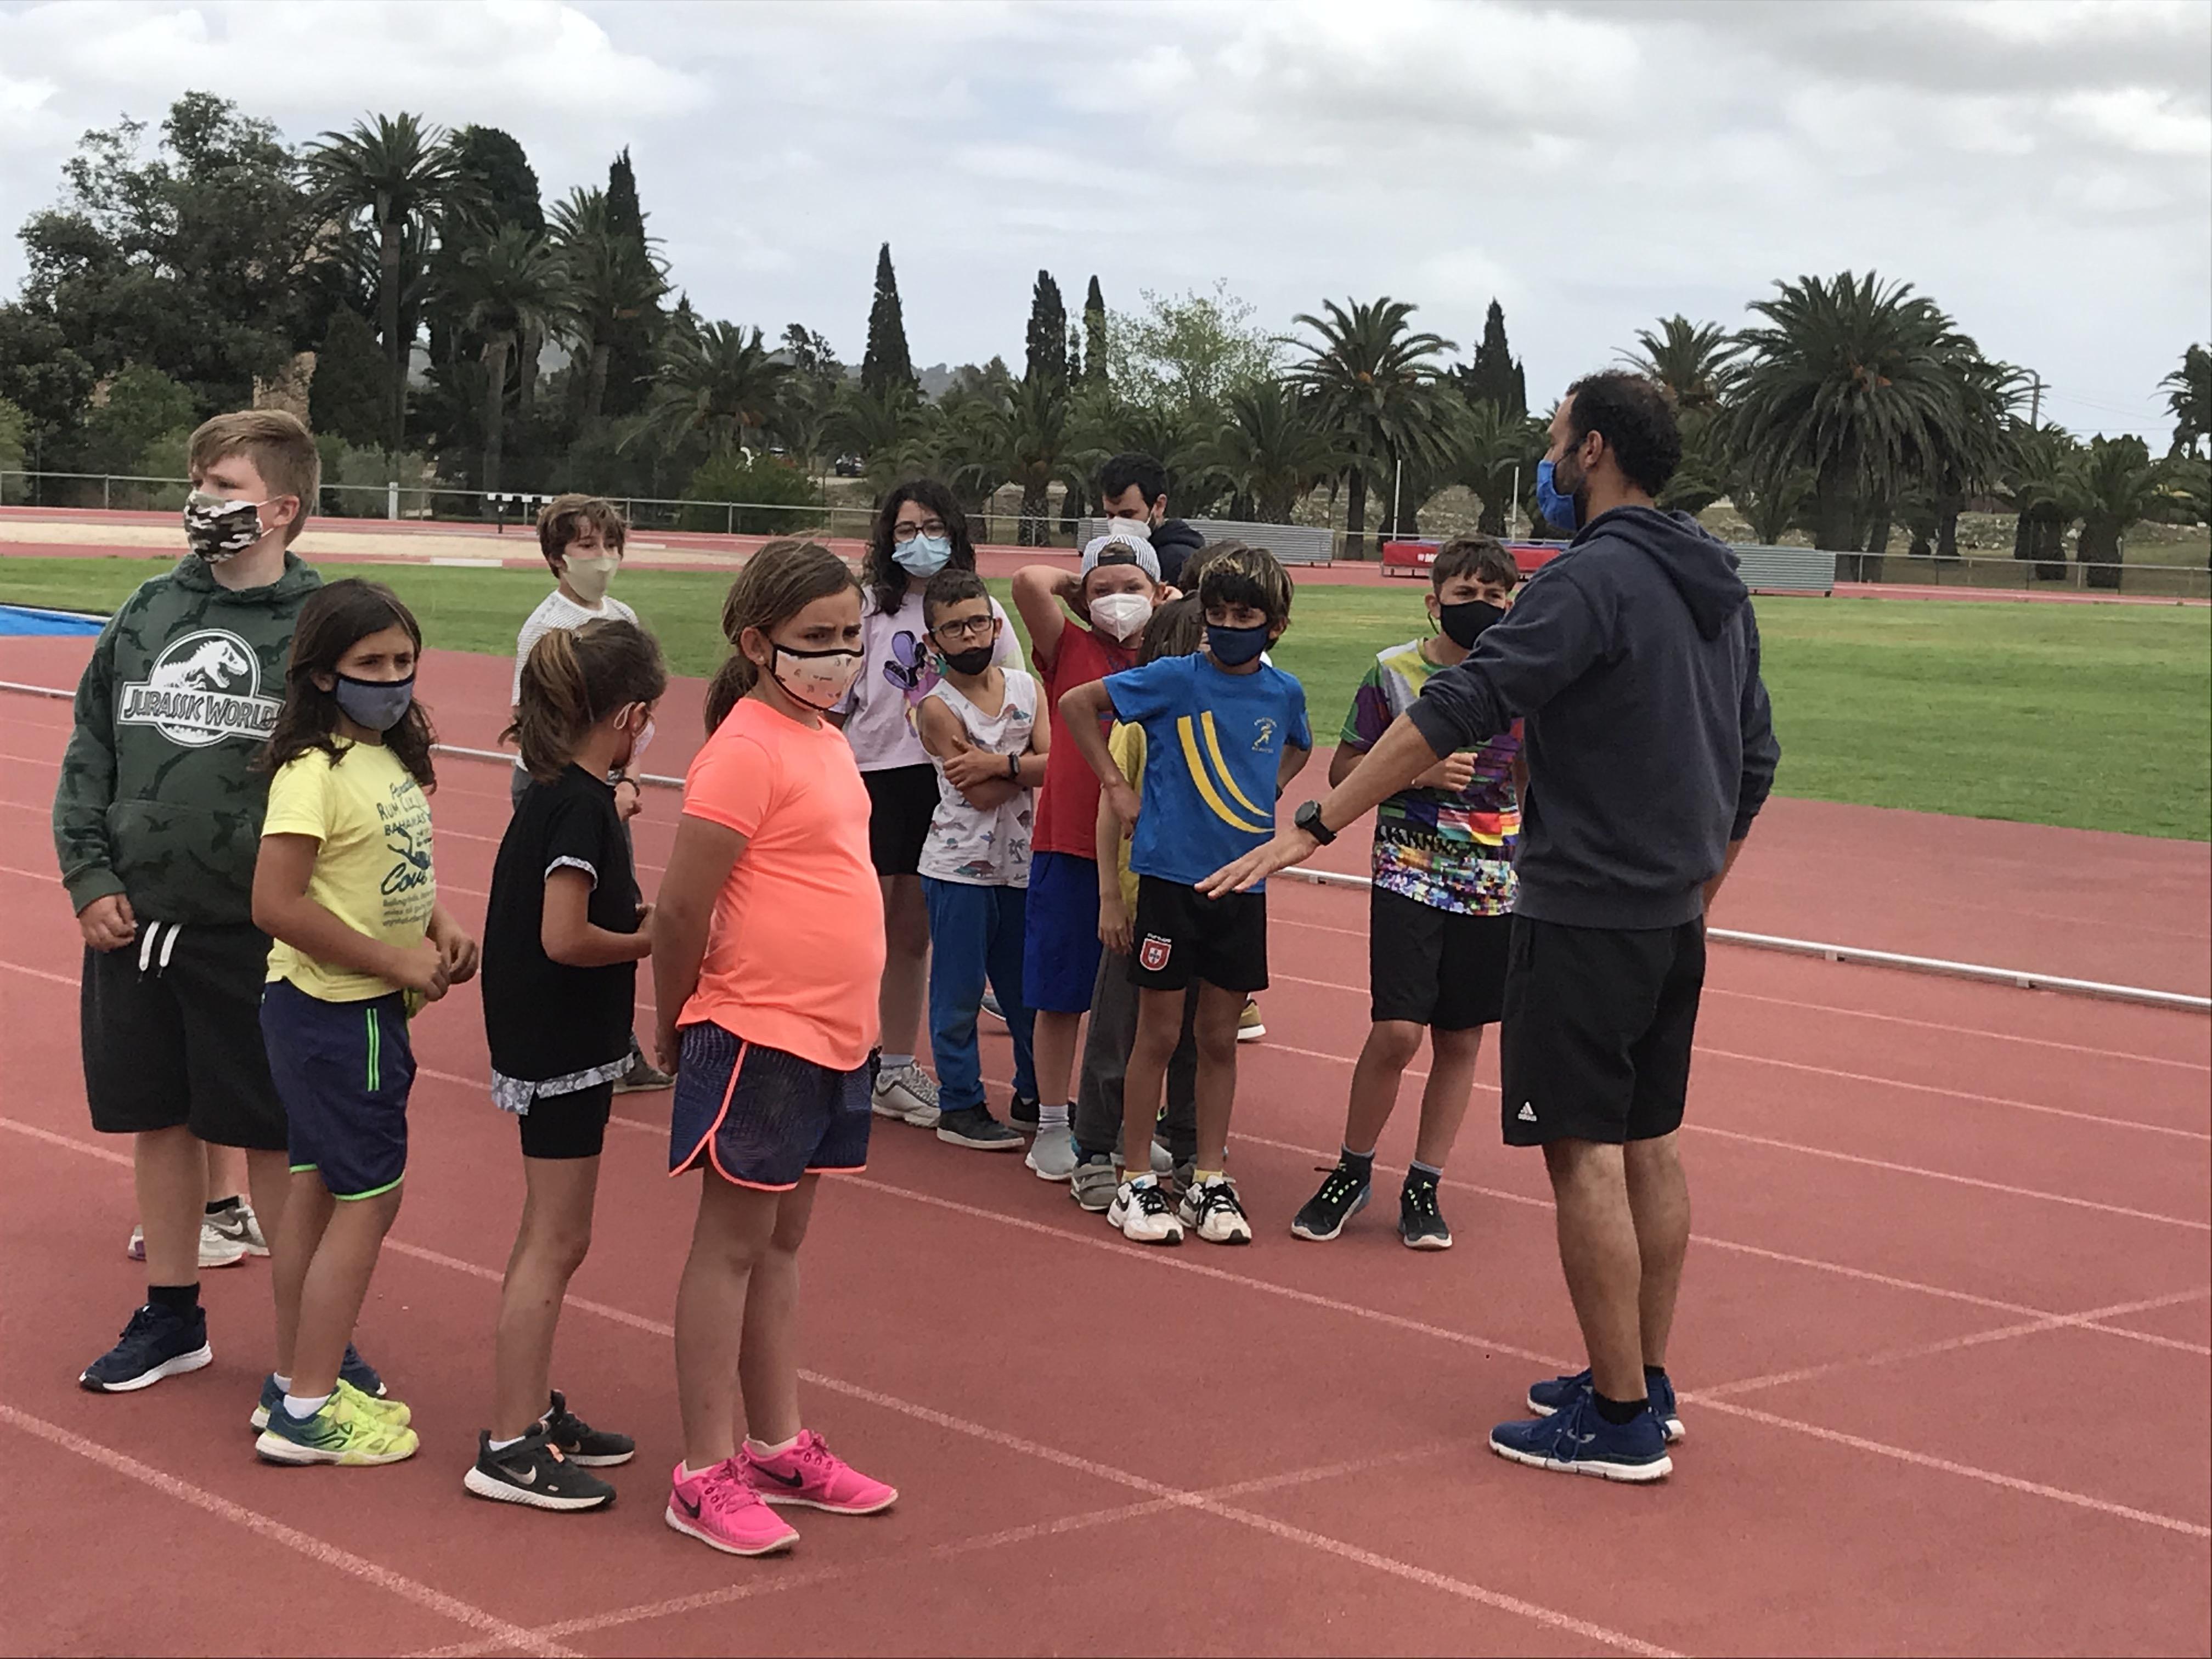 Atletisme a Manacor 2021